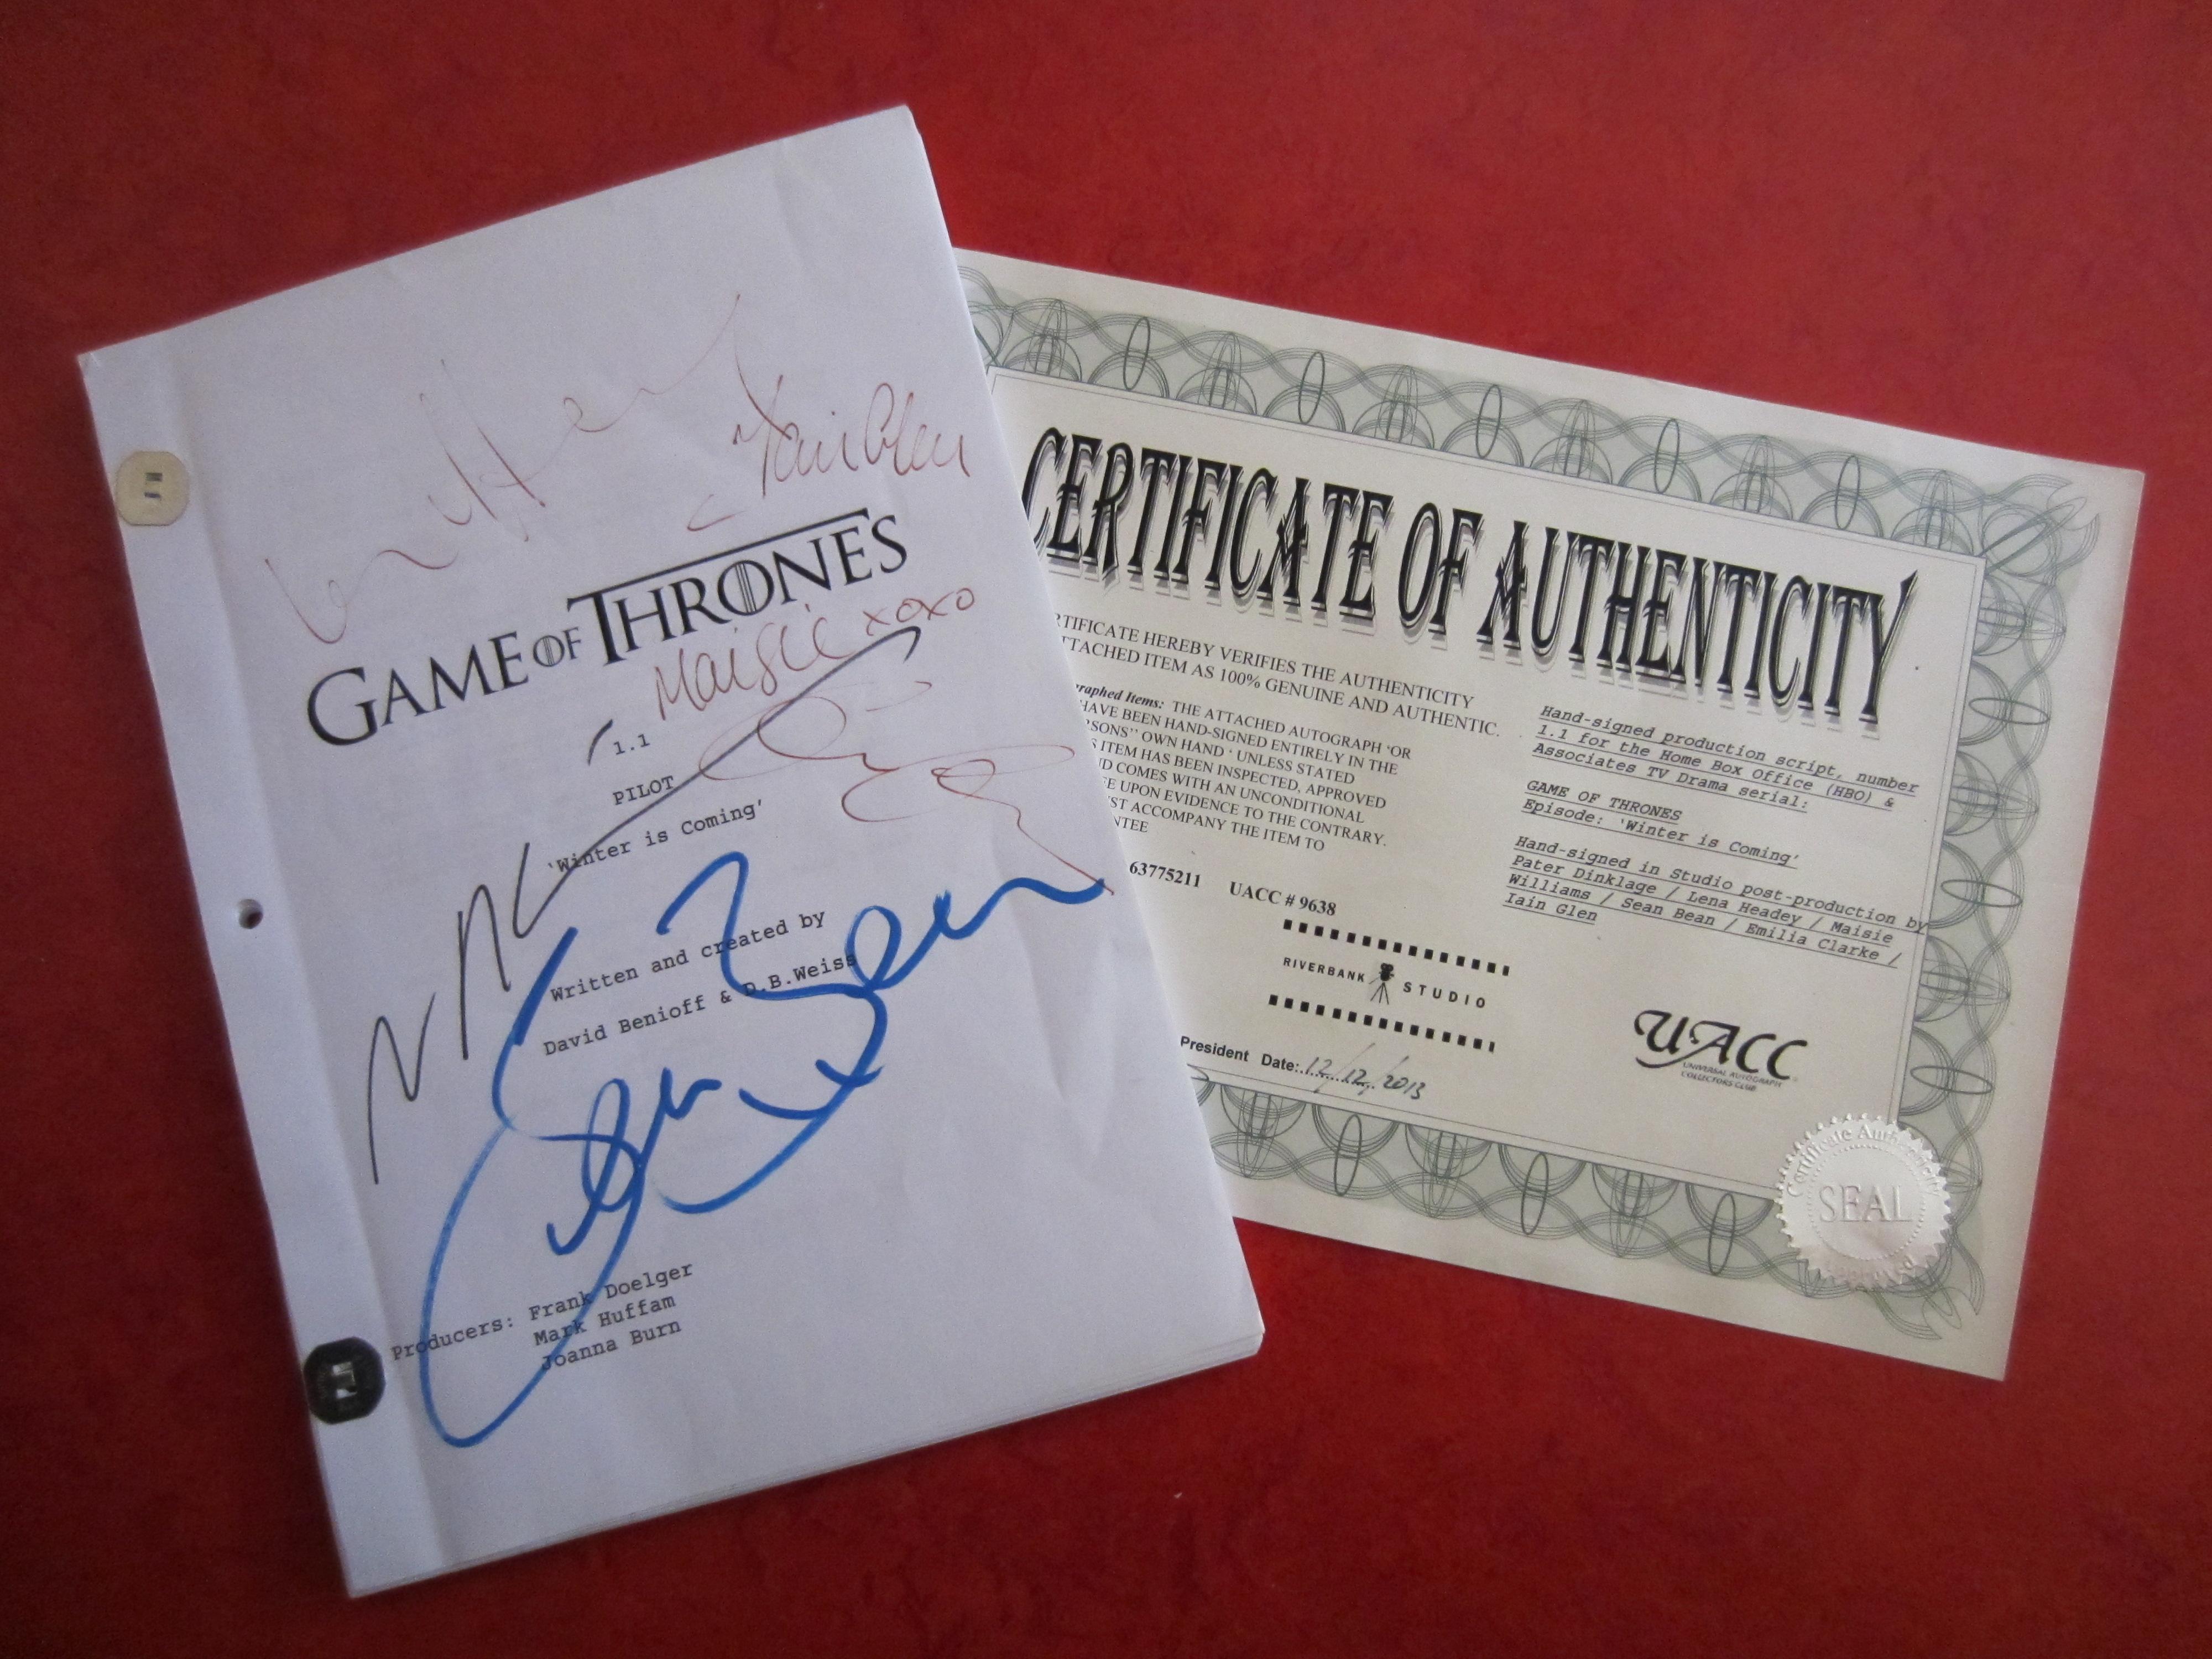 Histoire d 39 expert game of thrones kurt cobain et charlie chaplin cat - Objet game of thrones ...